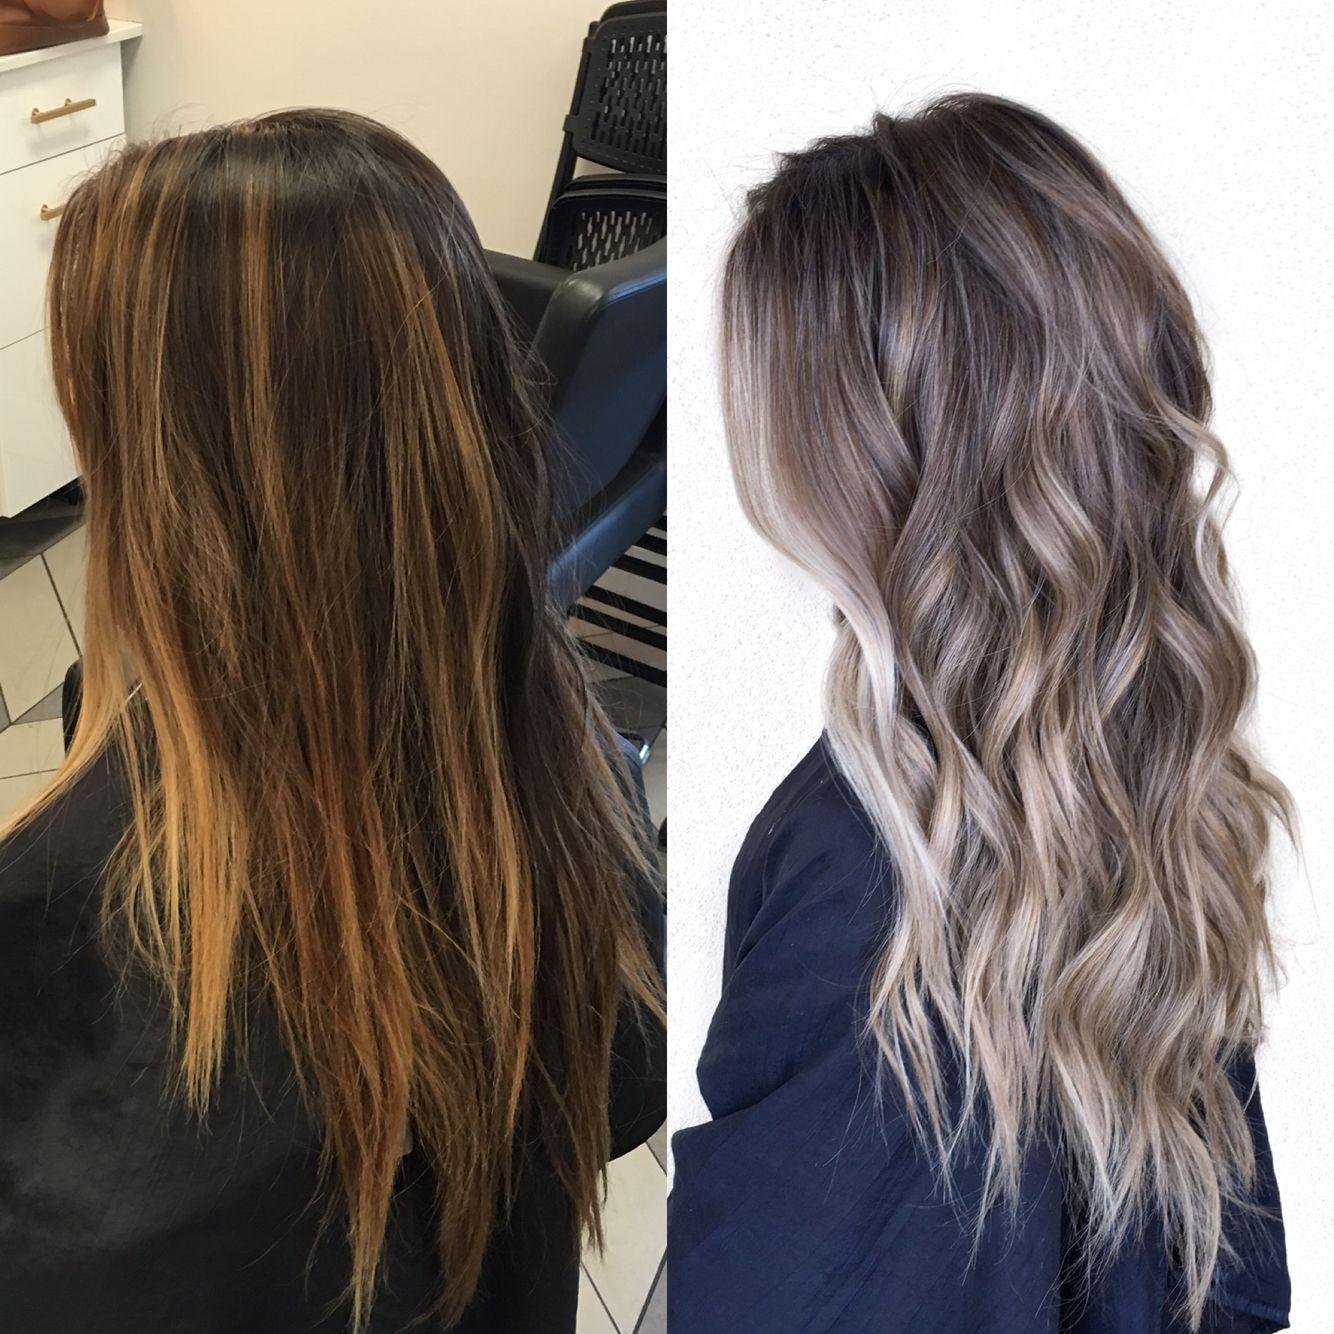 Before \u0026 After HabitSalon BabyLights HairInspo in 2019